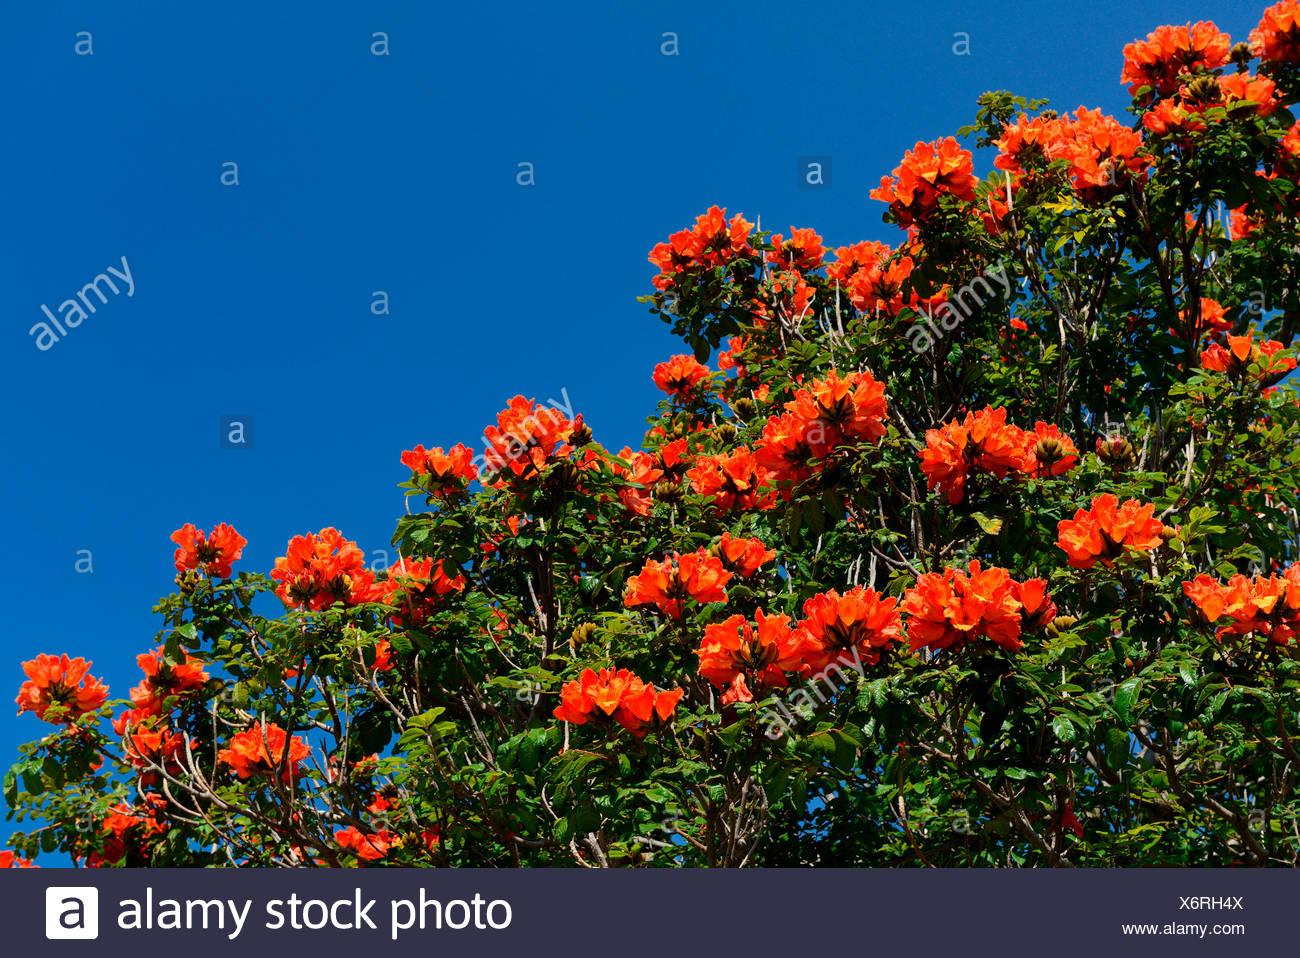 Afrikanischer Tulpenbaum / (Spathodea campanulata), Funchal, Madeira, Portugal - Stock Image